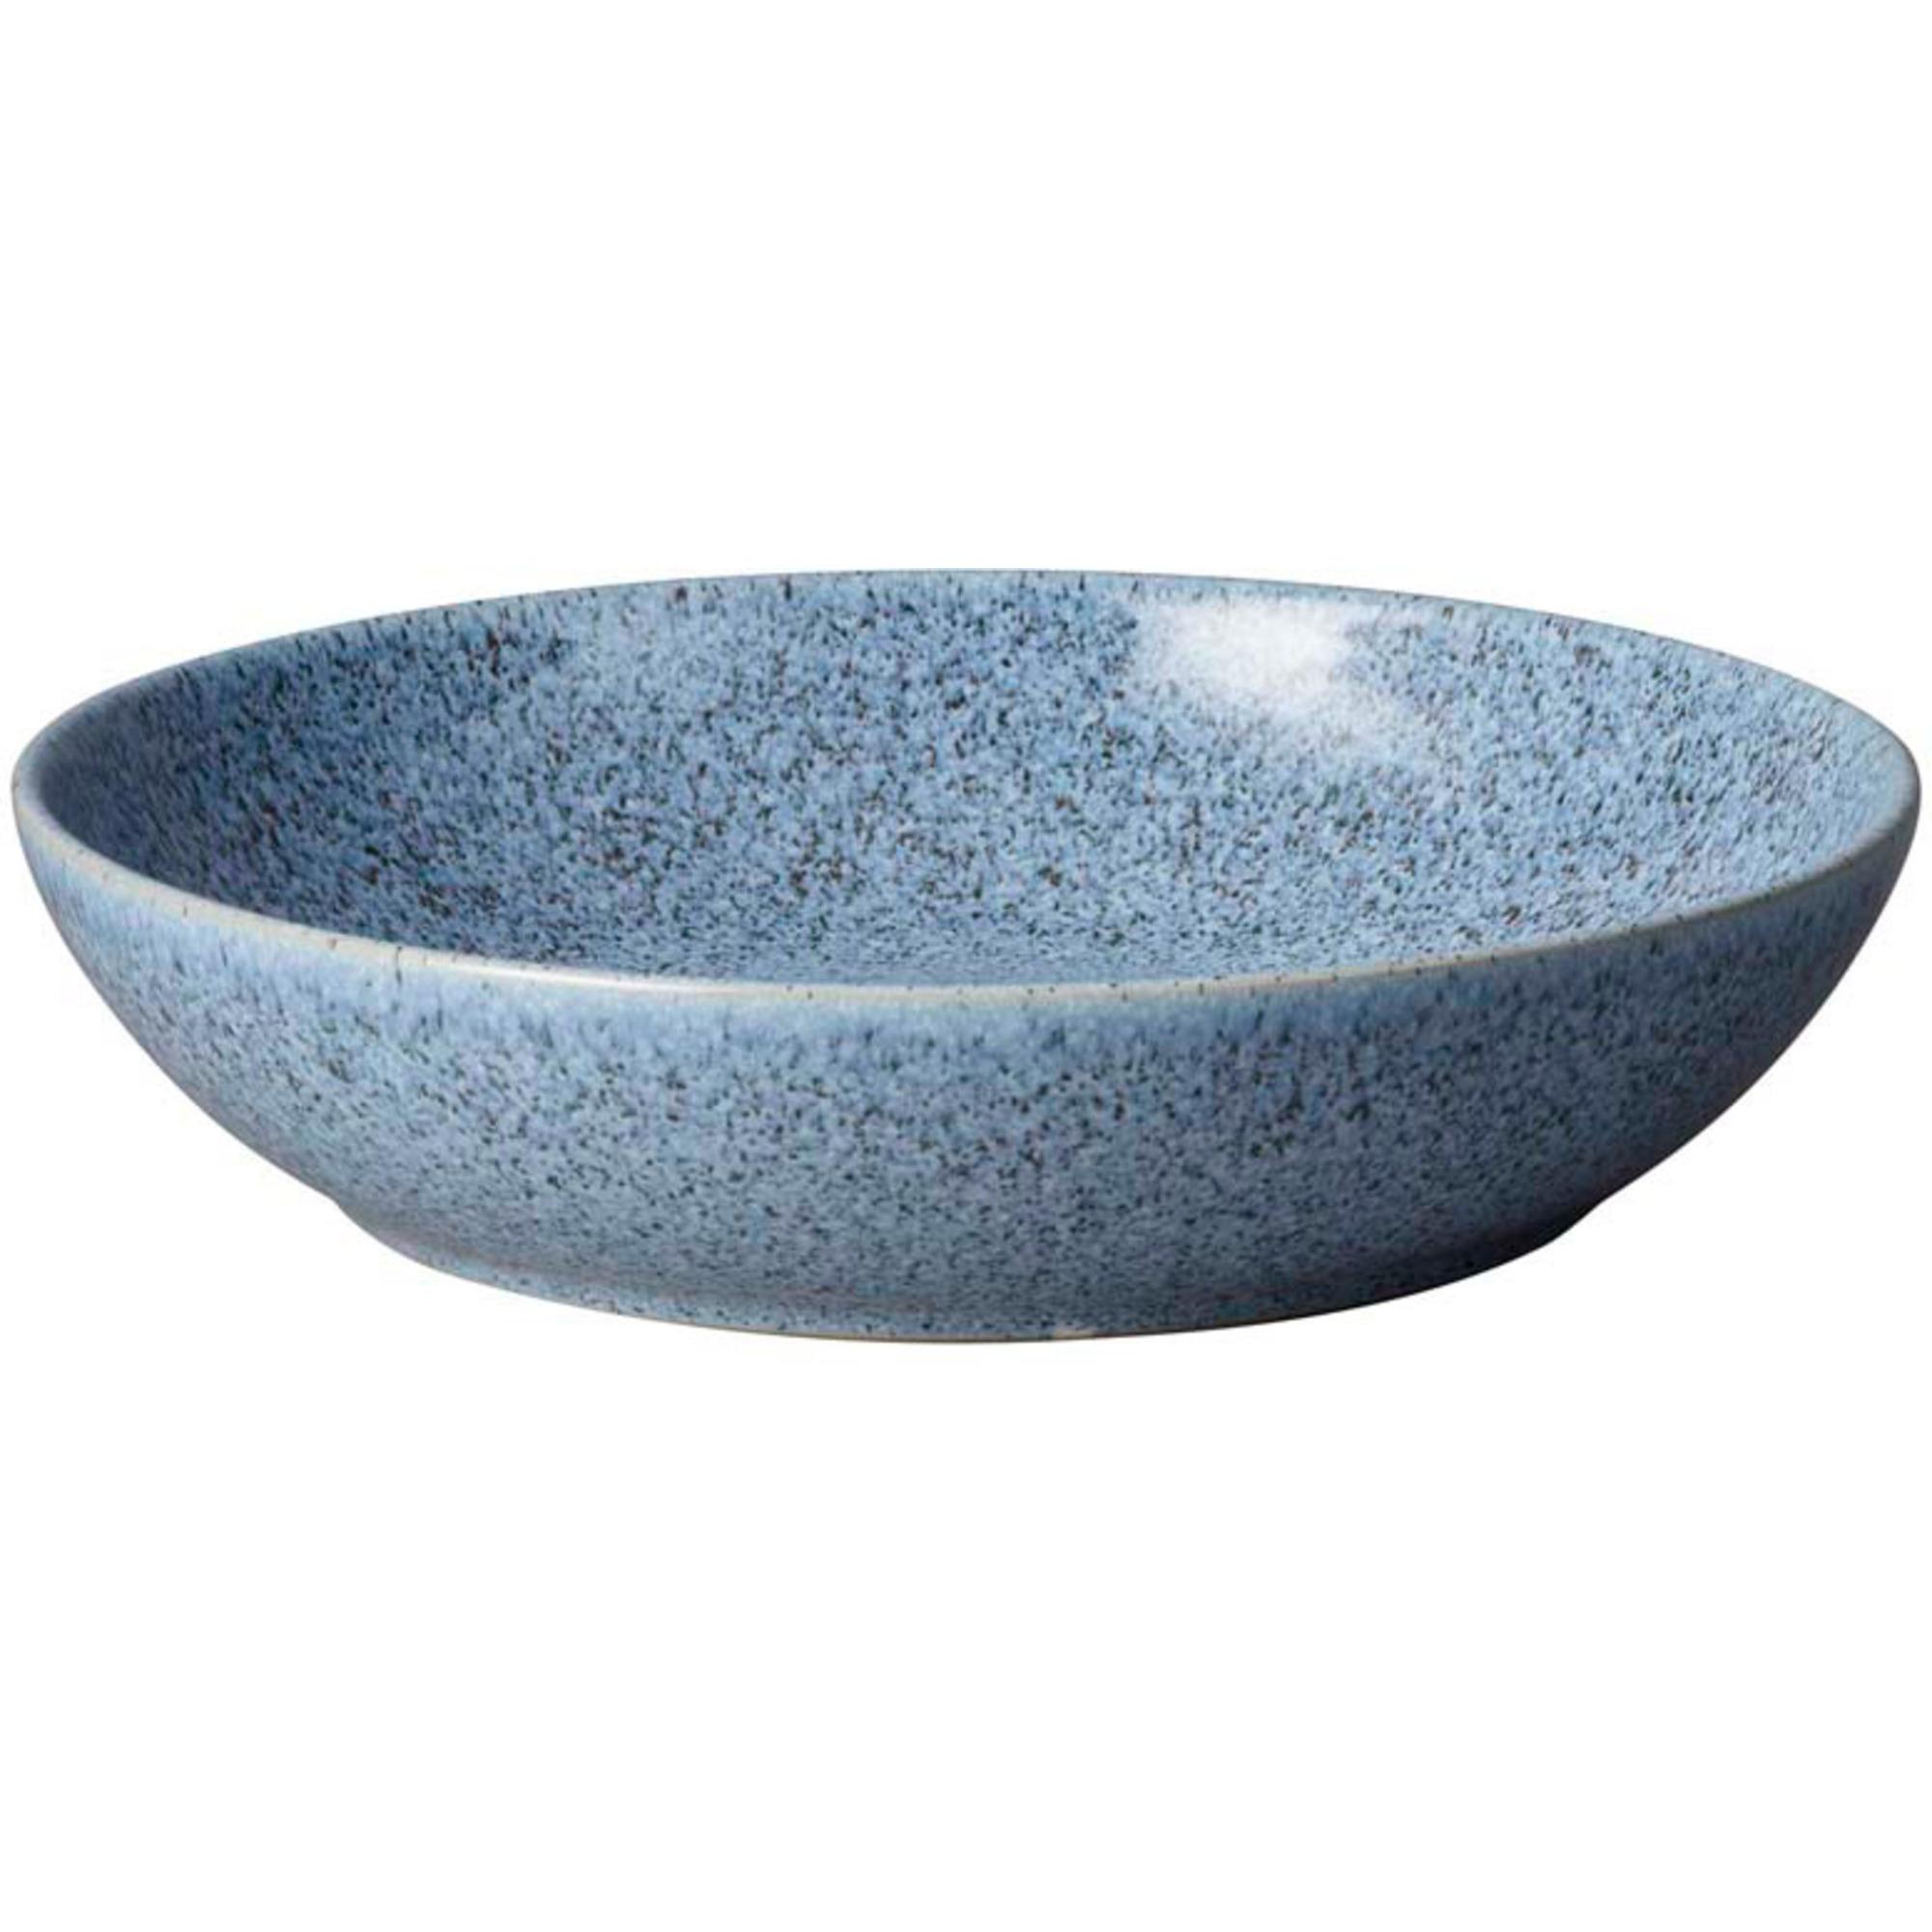 Denby Studio Blue Pastaskål 22 cm Flint